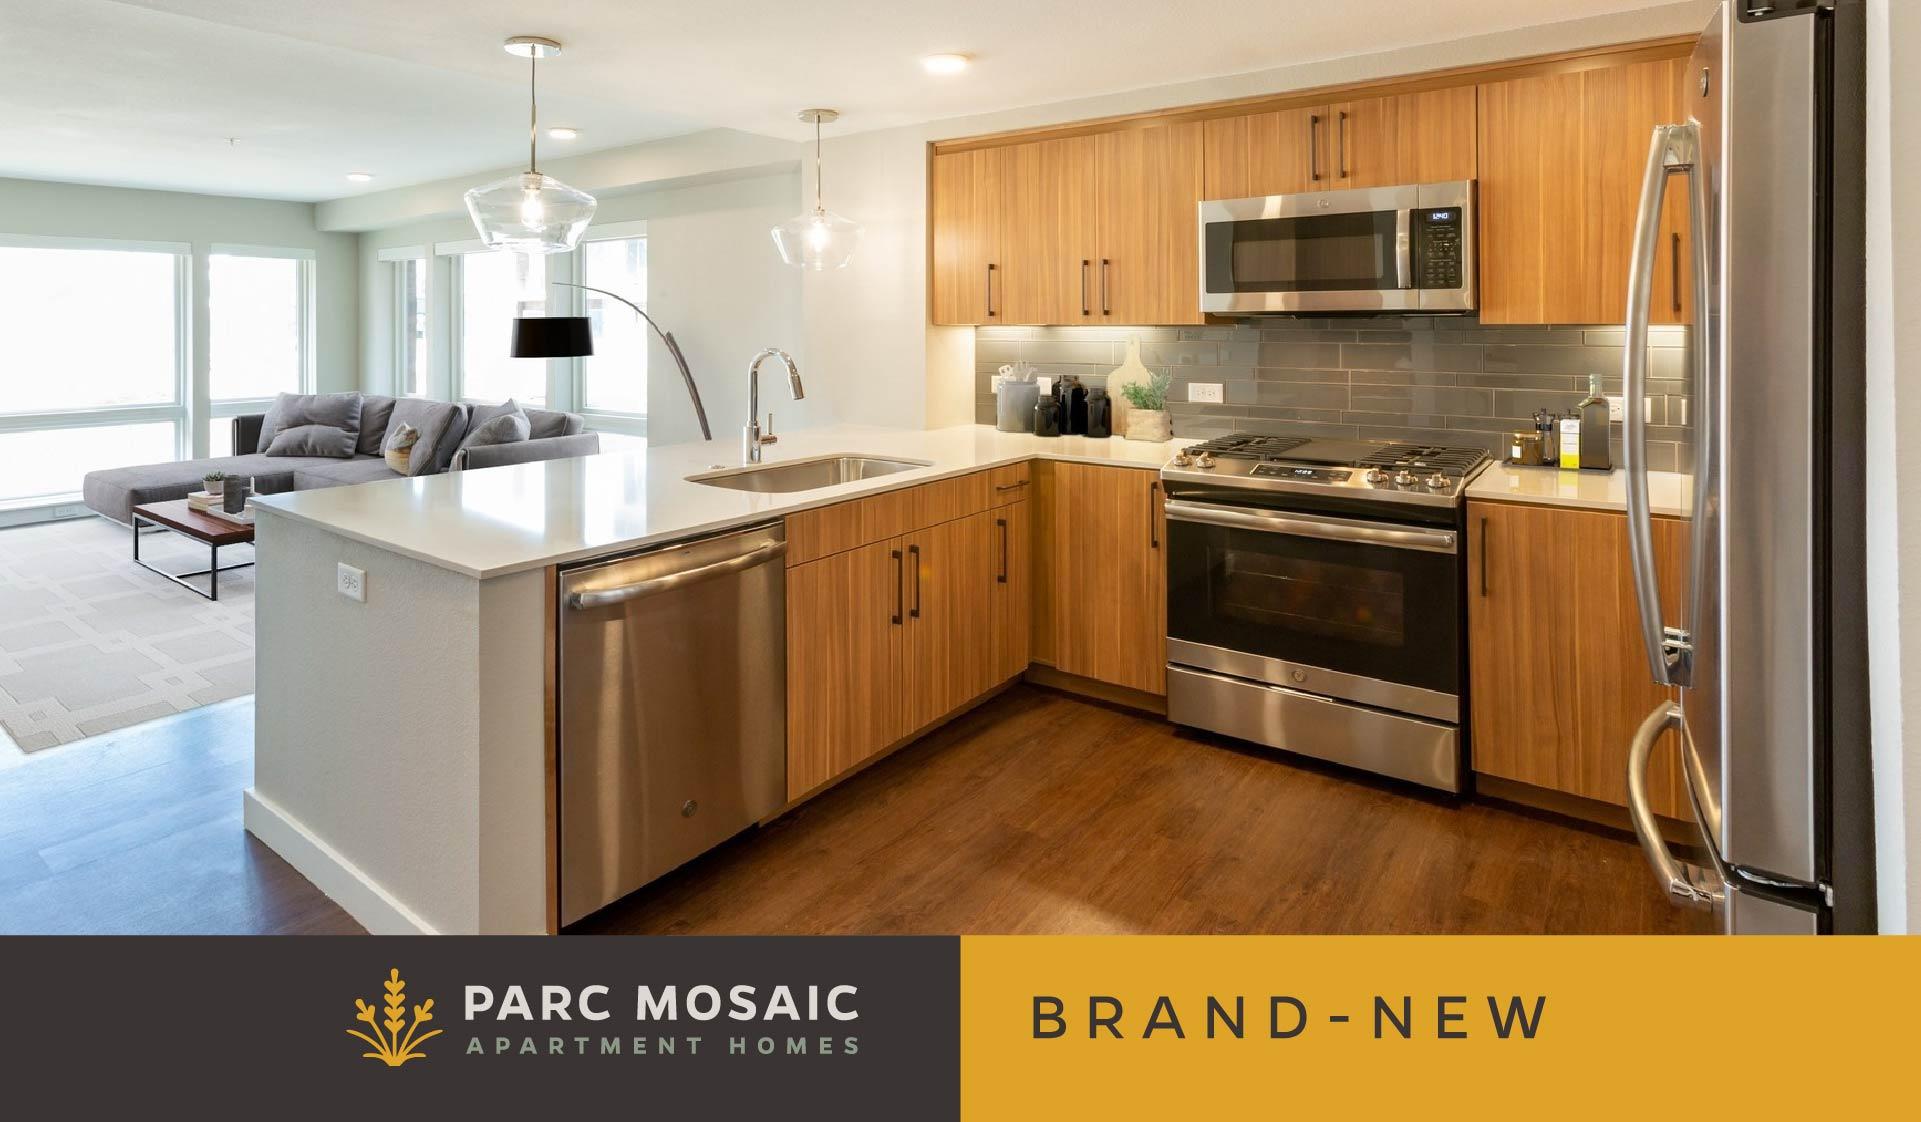 Tremendous 20 Best Apartments For Rent In Boulder Co With Pictures Interior Design Ideas Tzicisoteloinfo